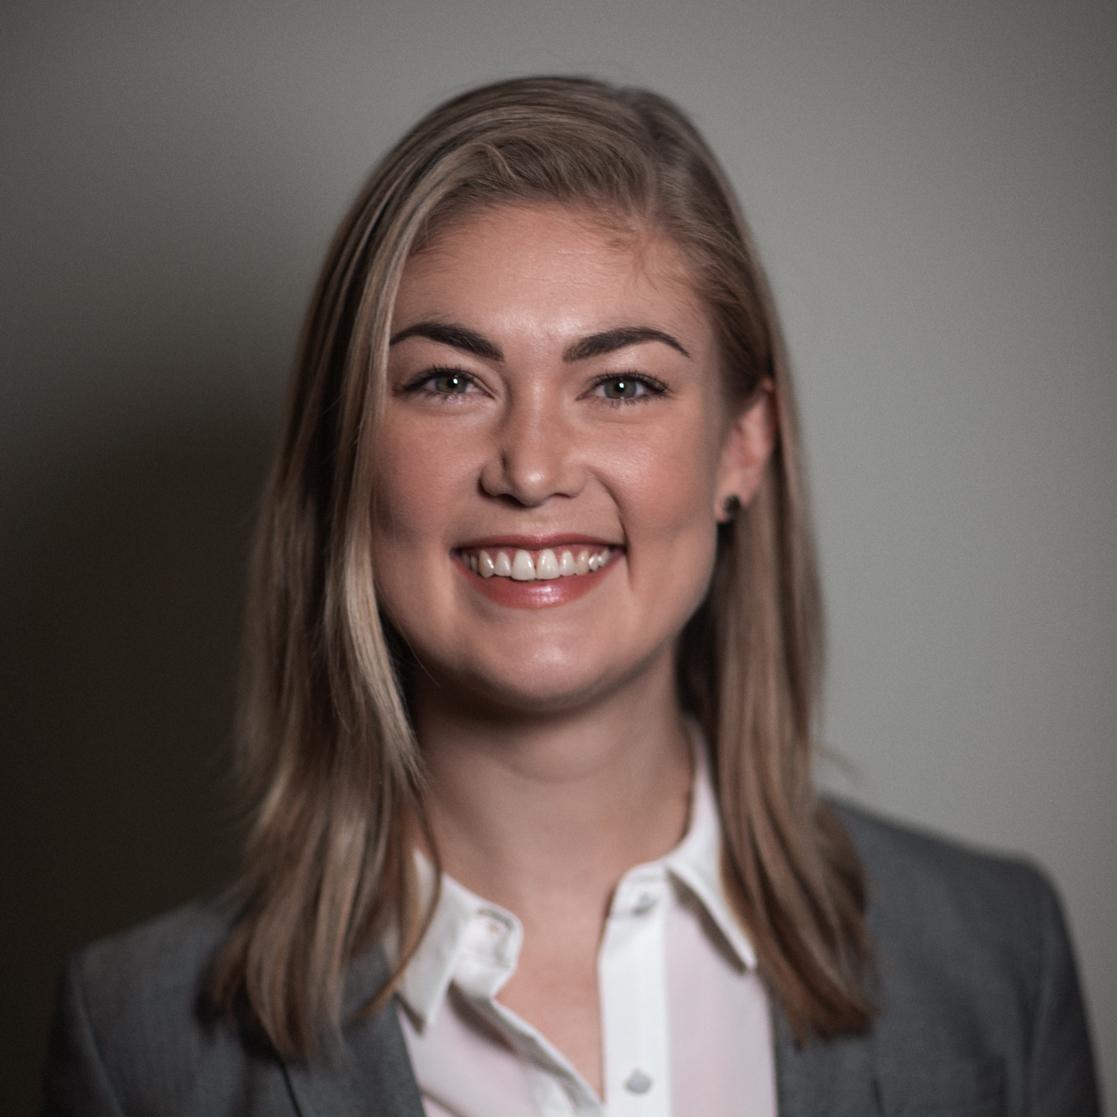 Veronica L. Haasbeek